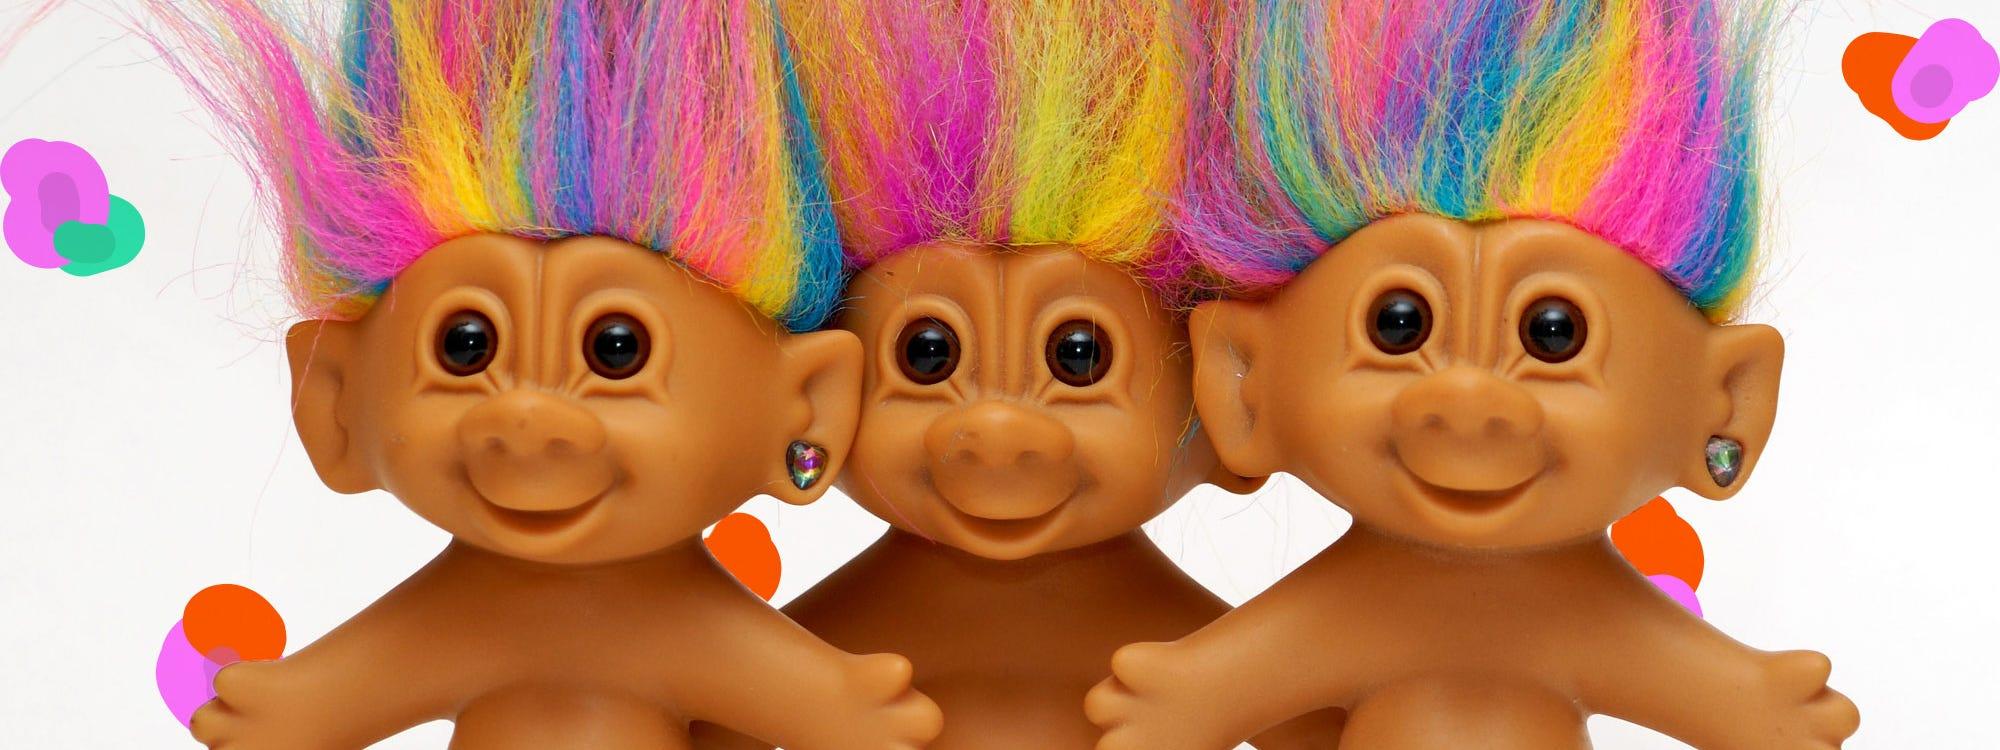 mac trolls makeup collection